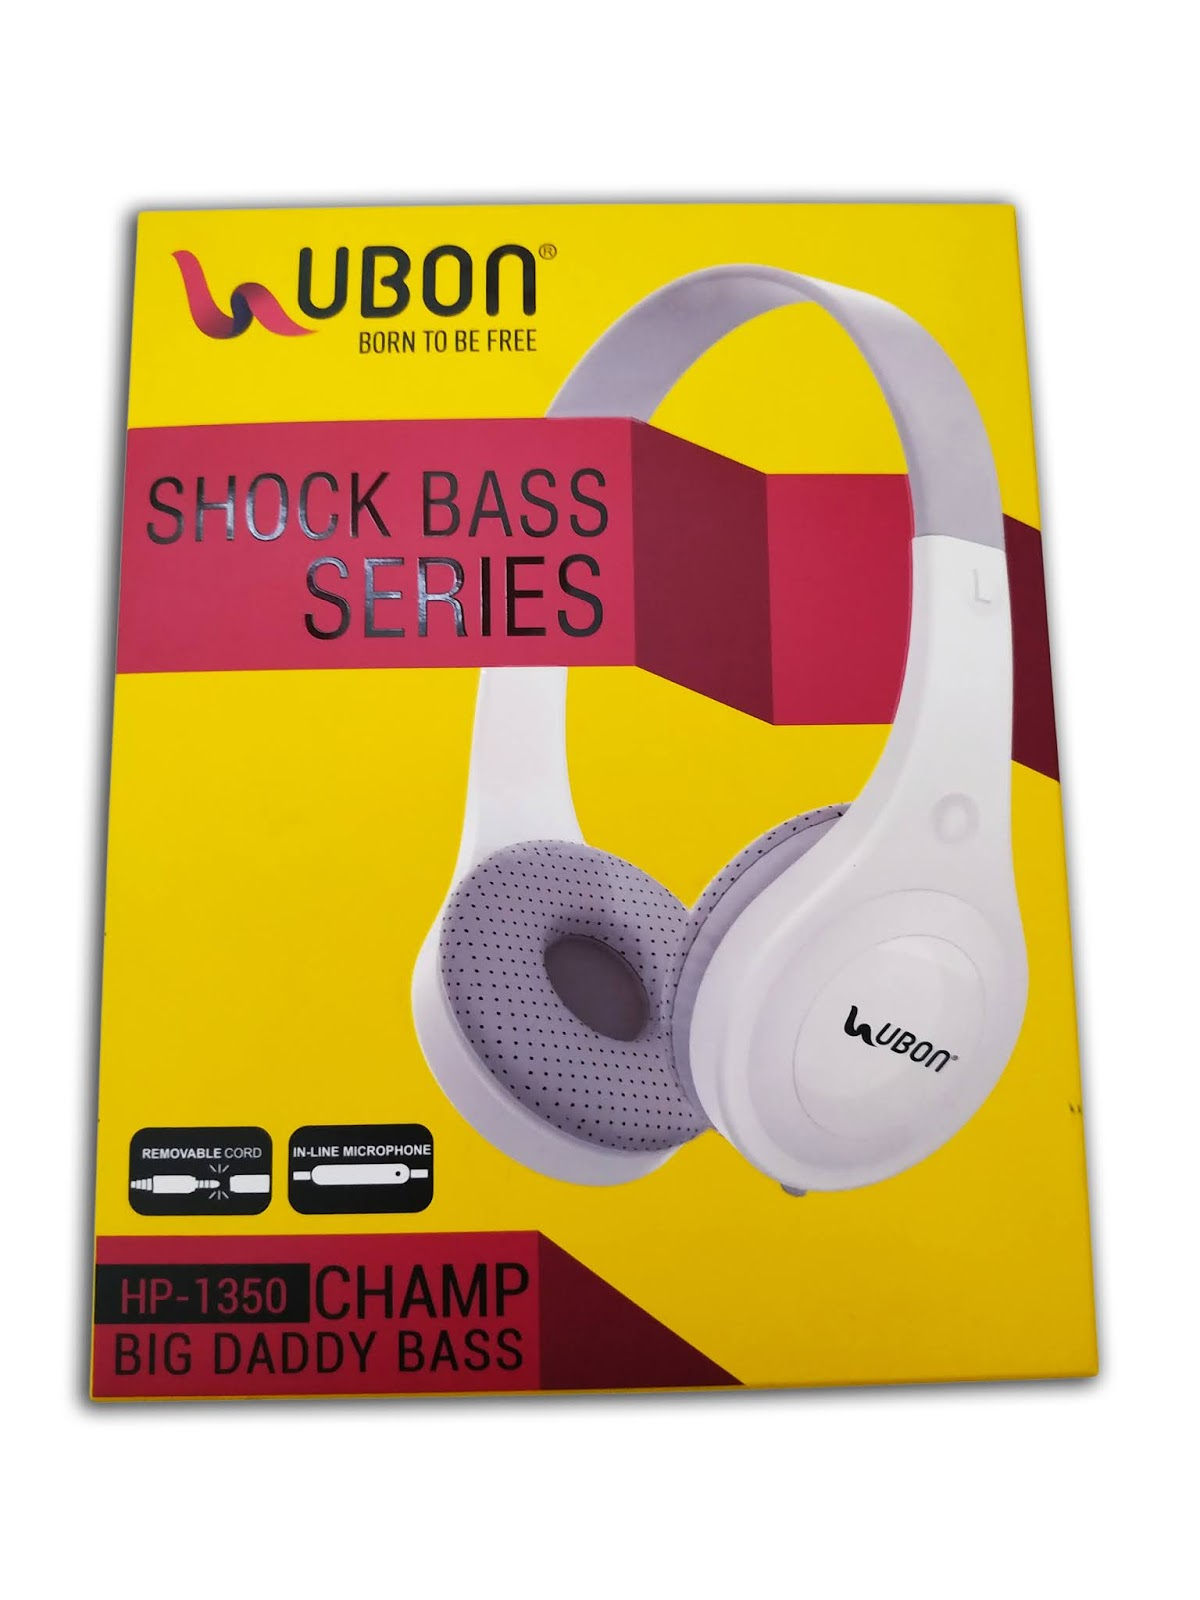 Ubon Shock Bass Series Hp 1350 Champ Headphones On Ear Wired Black White Febborn India S Favorite Online Shopping Mall